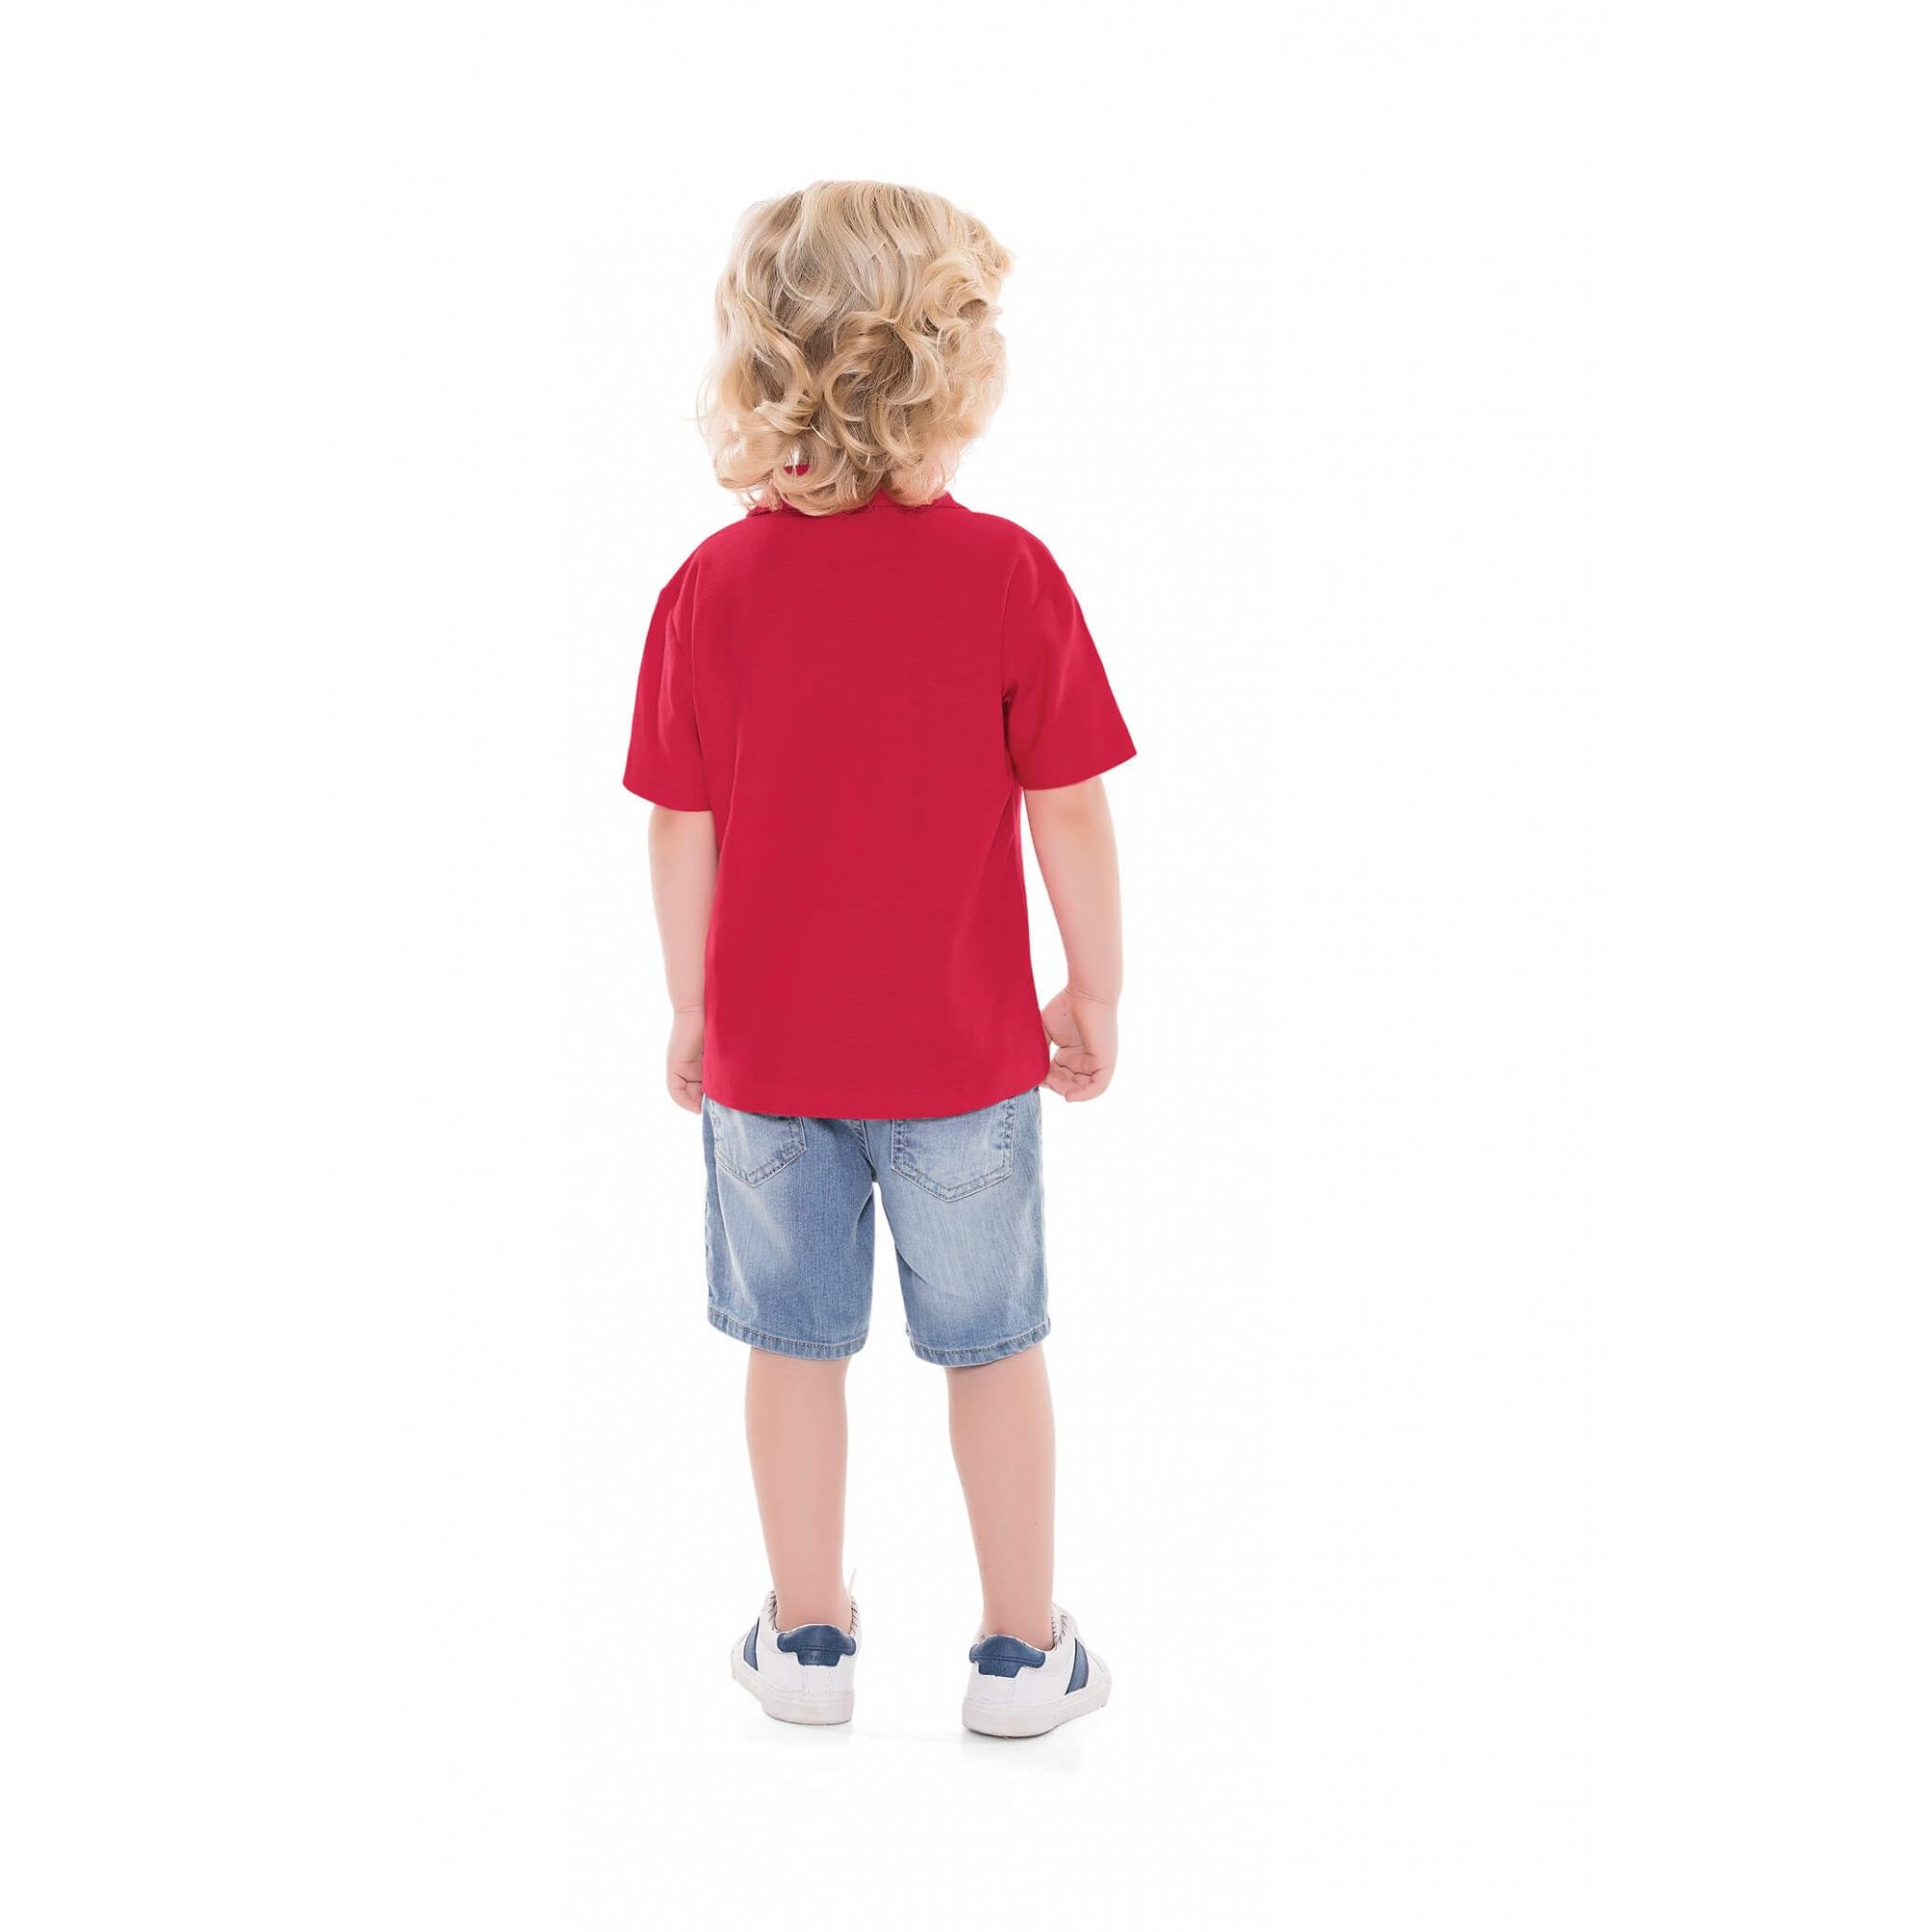 Camisa Polo Infantil Original Style - Playground